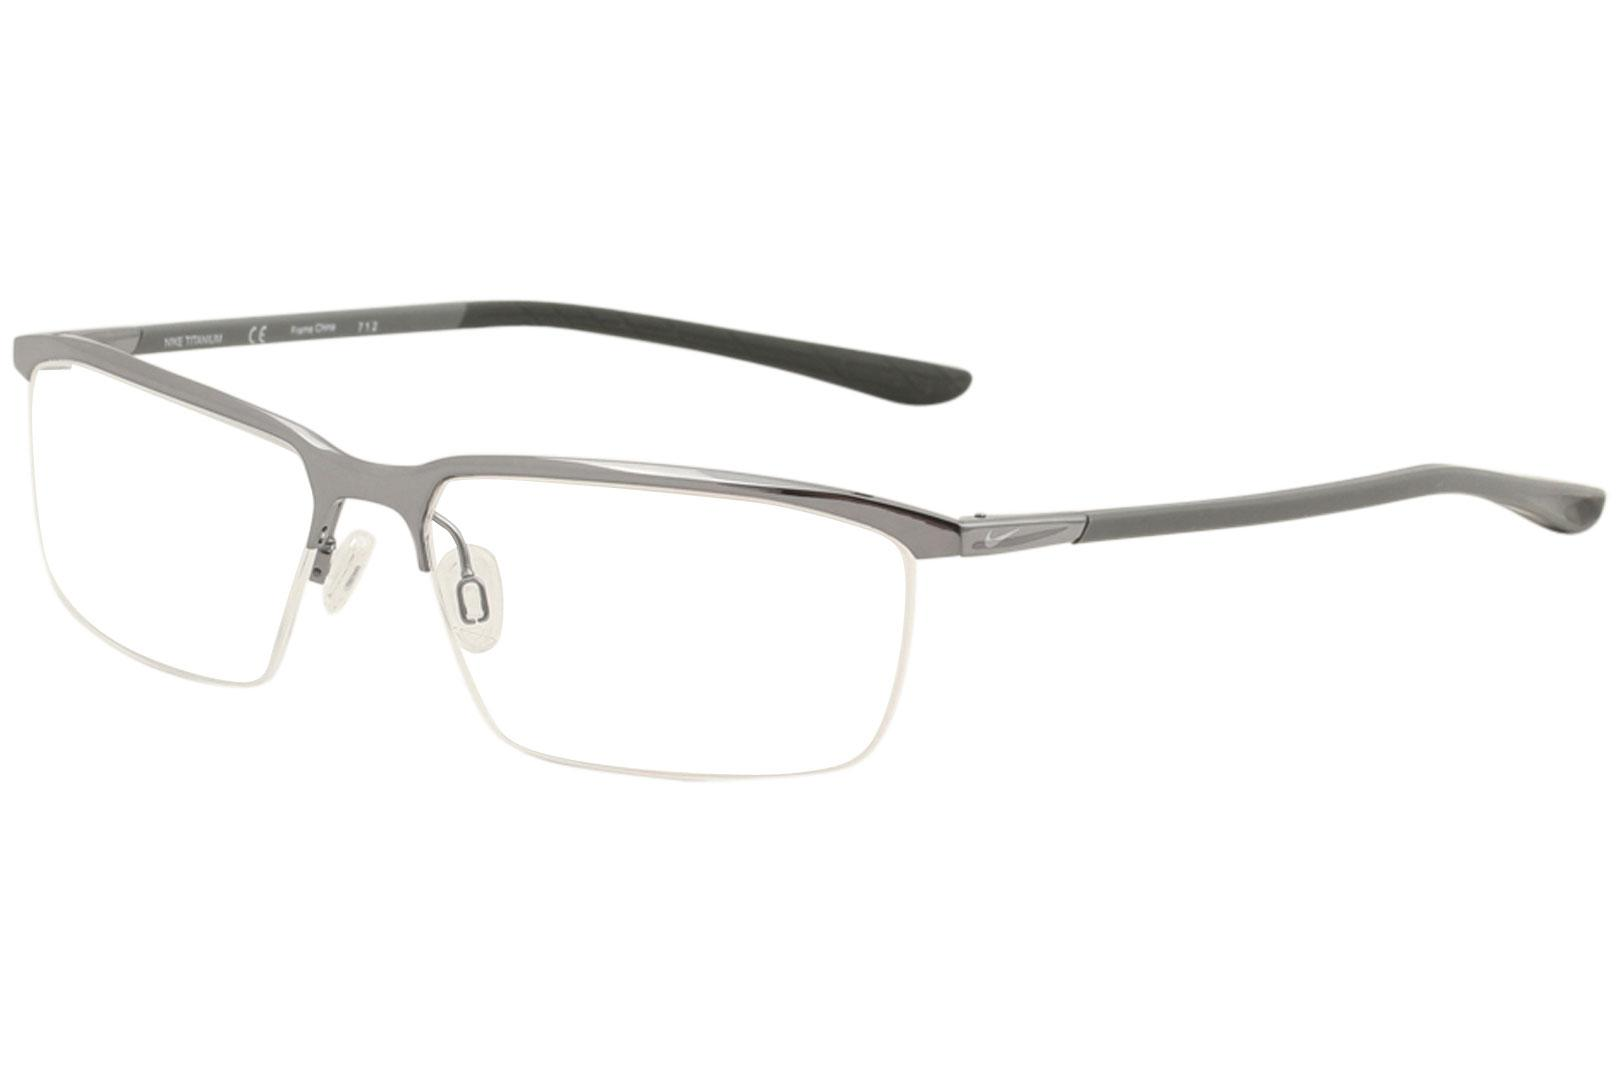 bb356ef986e Nike Men s Eyeglasses 6071 Half Rim Titanium Optical Frame